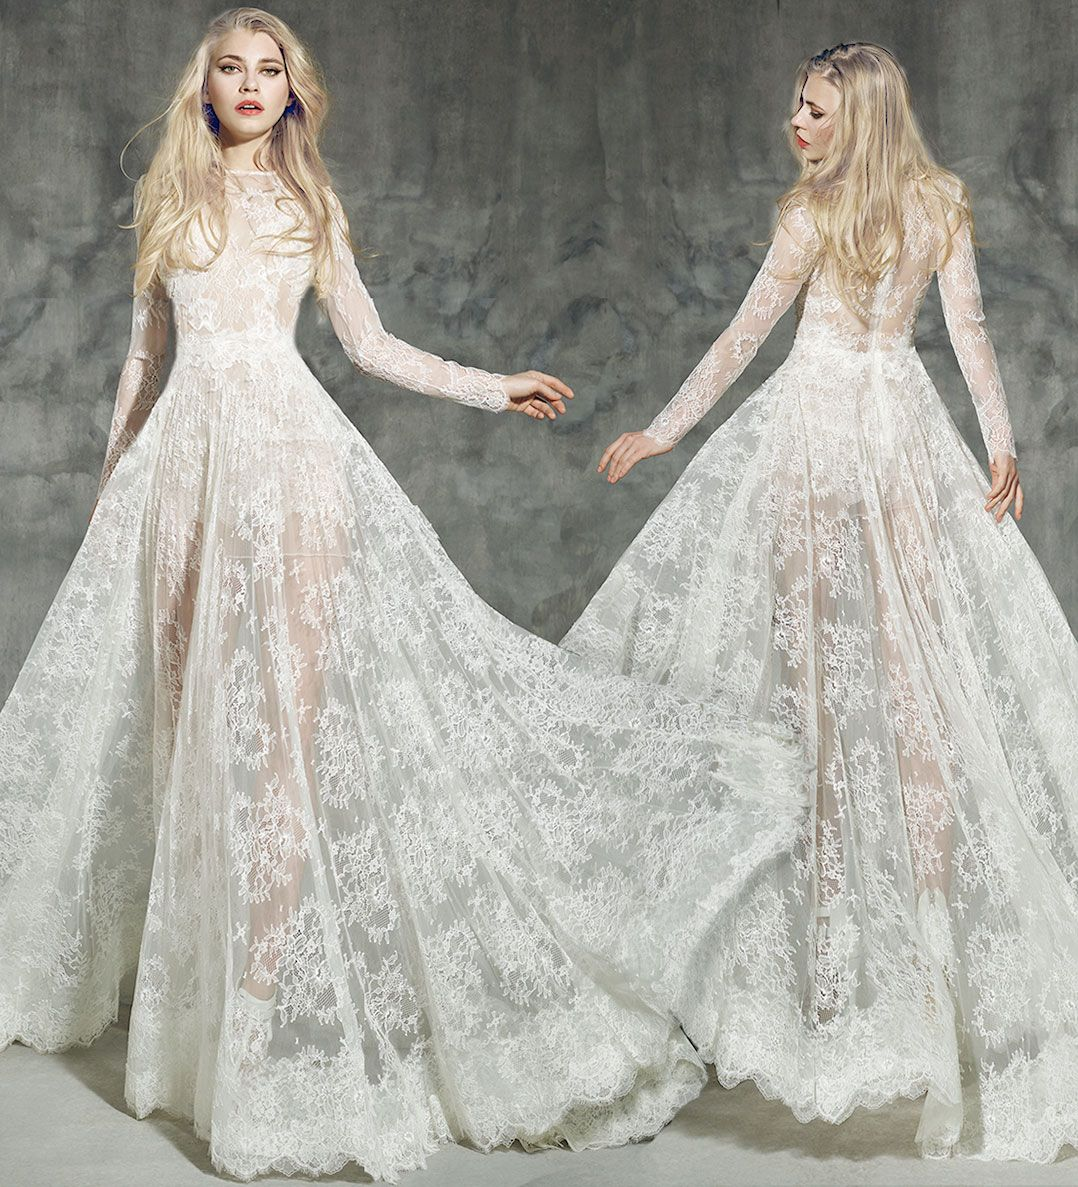 wedding gowns winter wedding dresses More